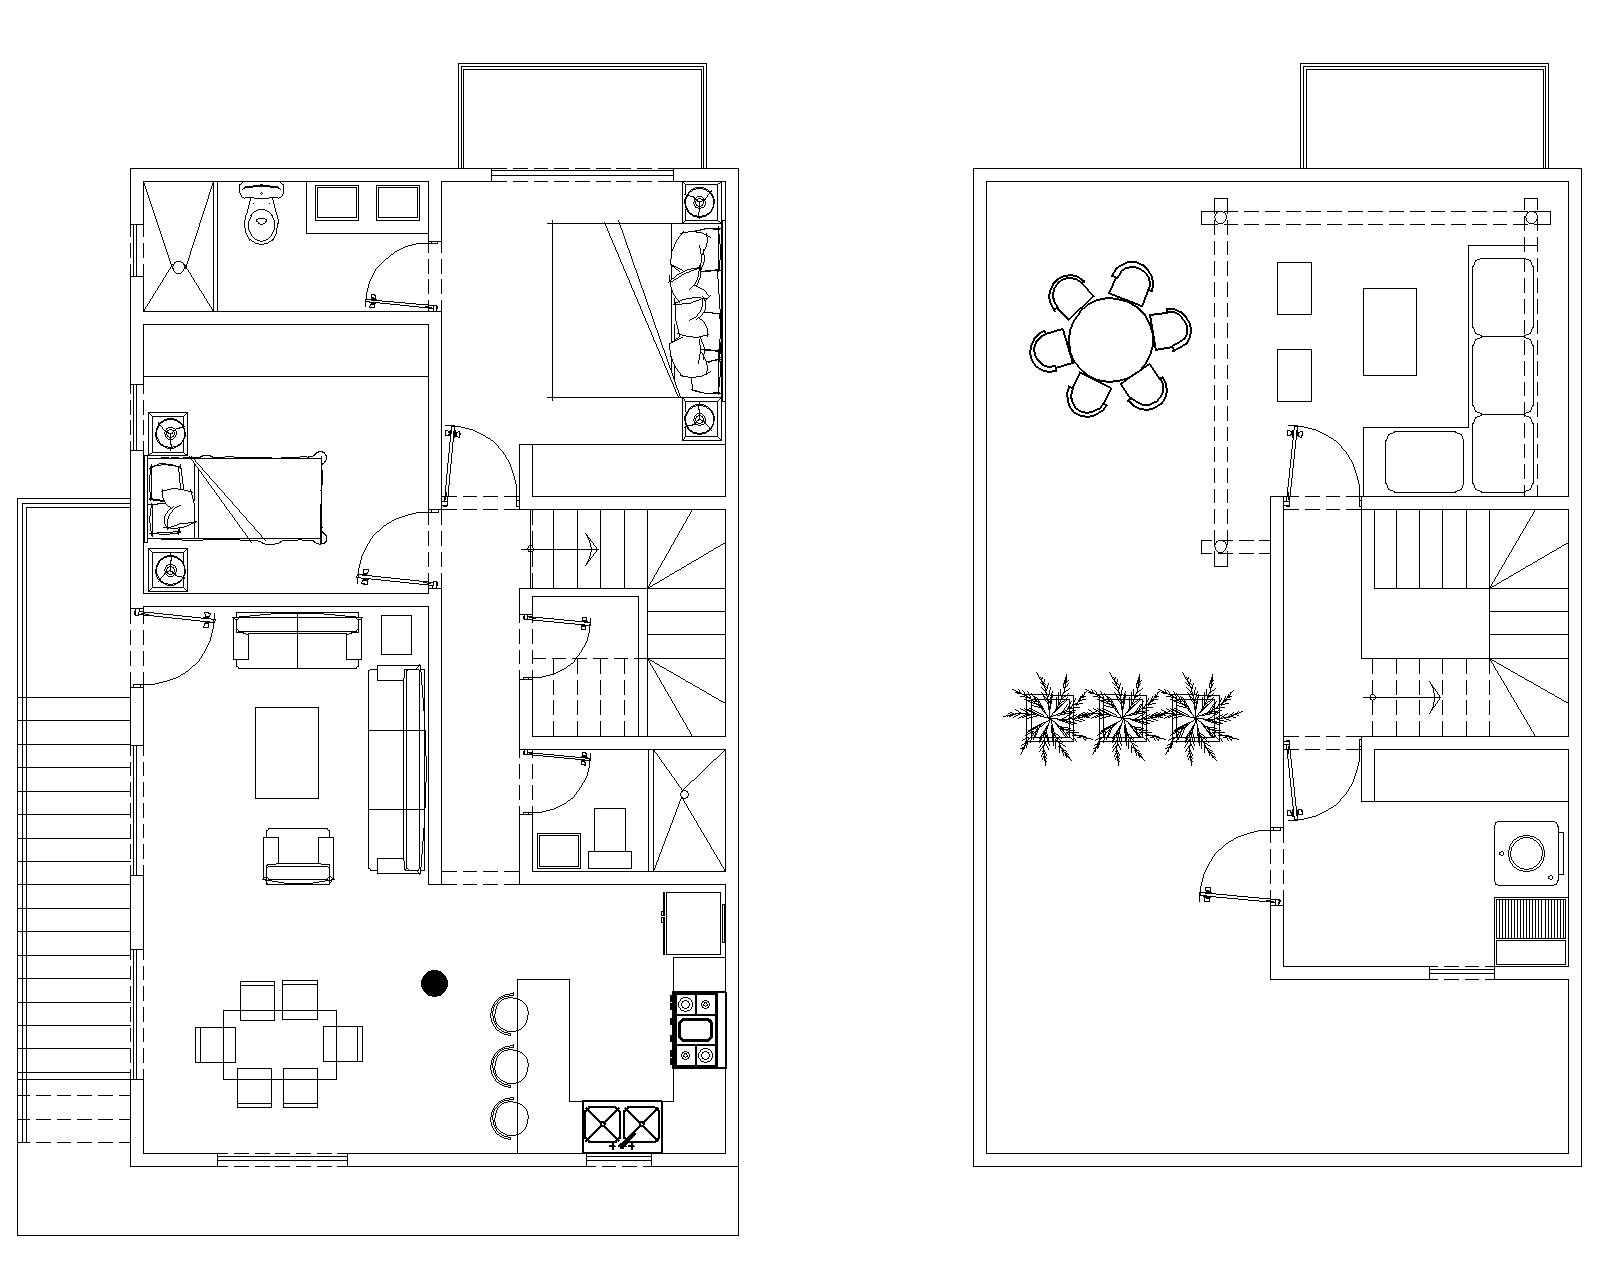 Proyecto Arquitectonico Pdf Of Spark Dise O Arquitect Nico